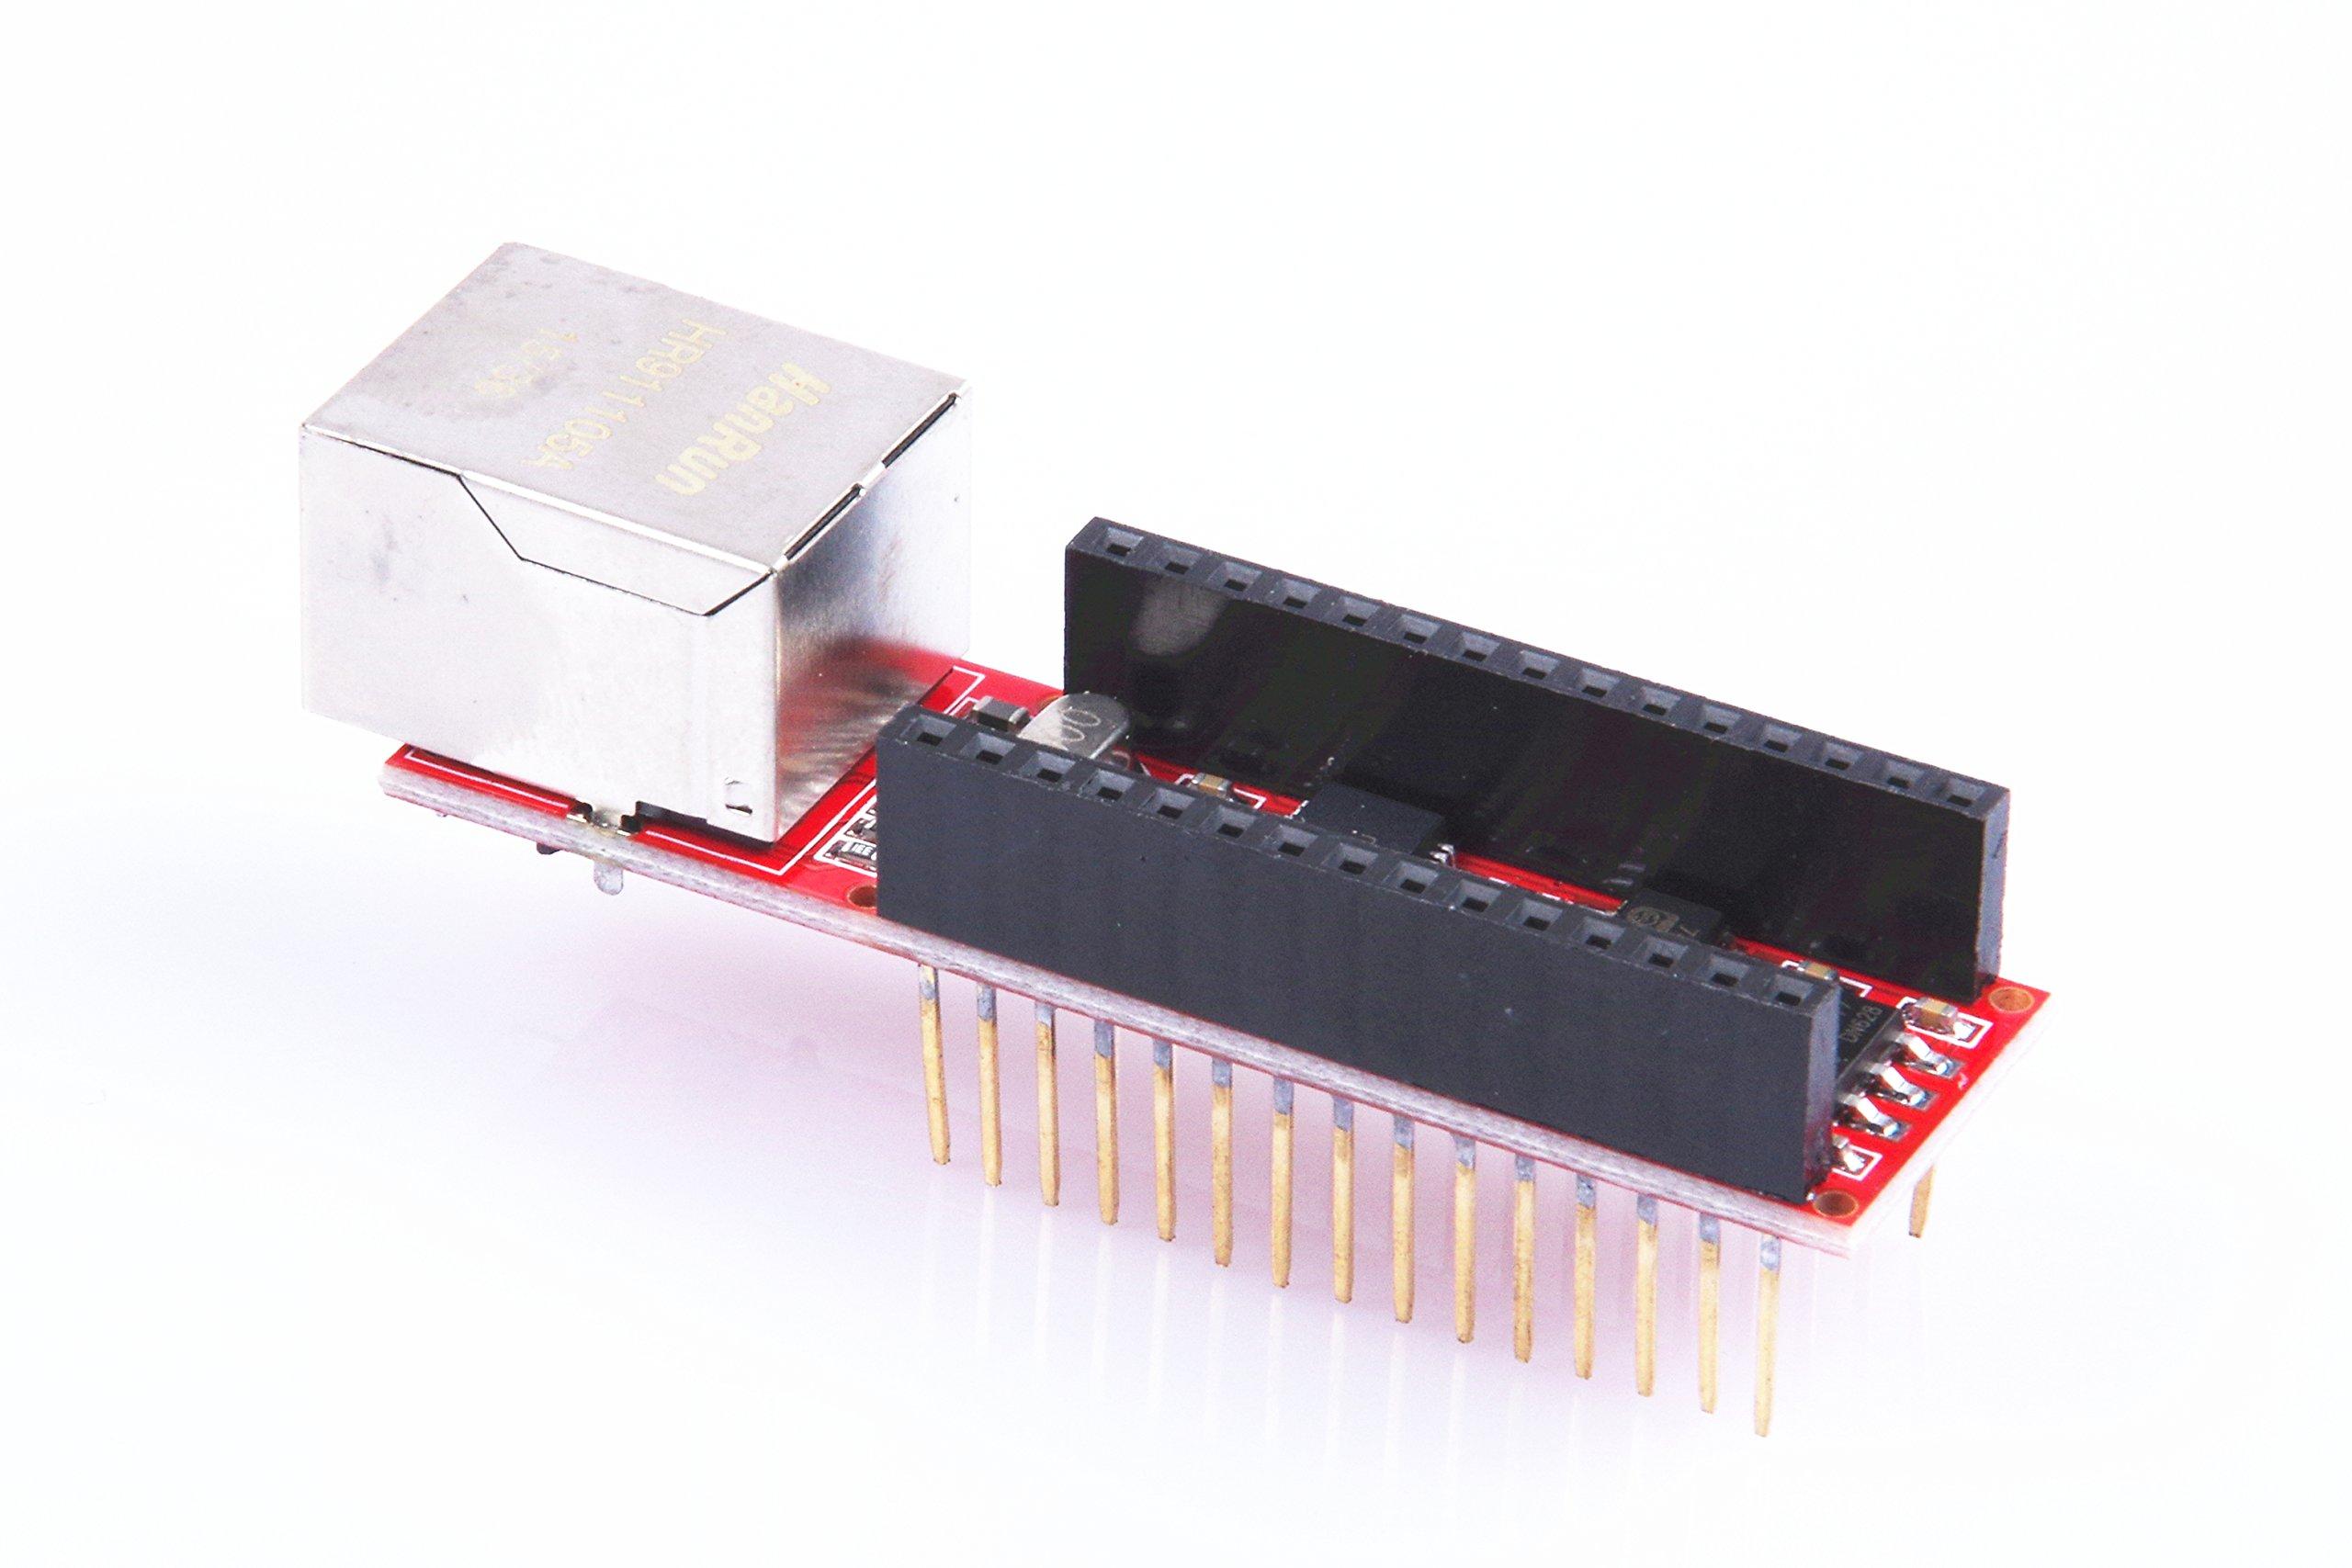 KNACRO Nano ENC28J60 Ethernet Shield for Arduino Nano 3.0 RJ45 Webserver Module TE317